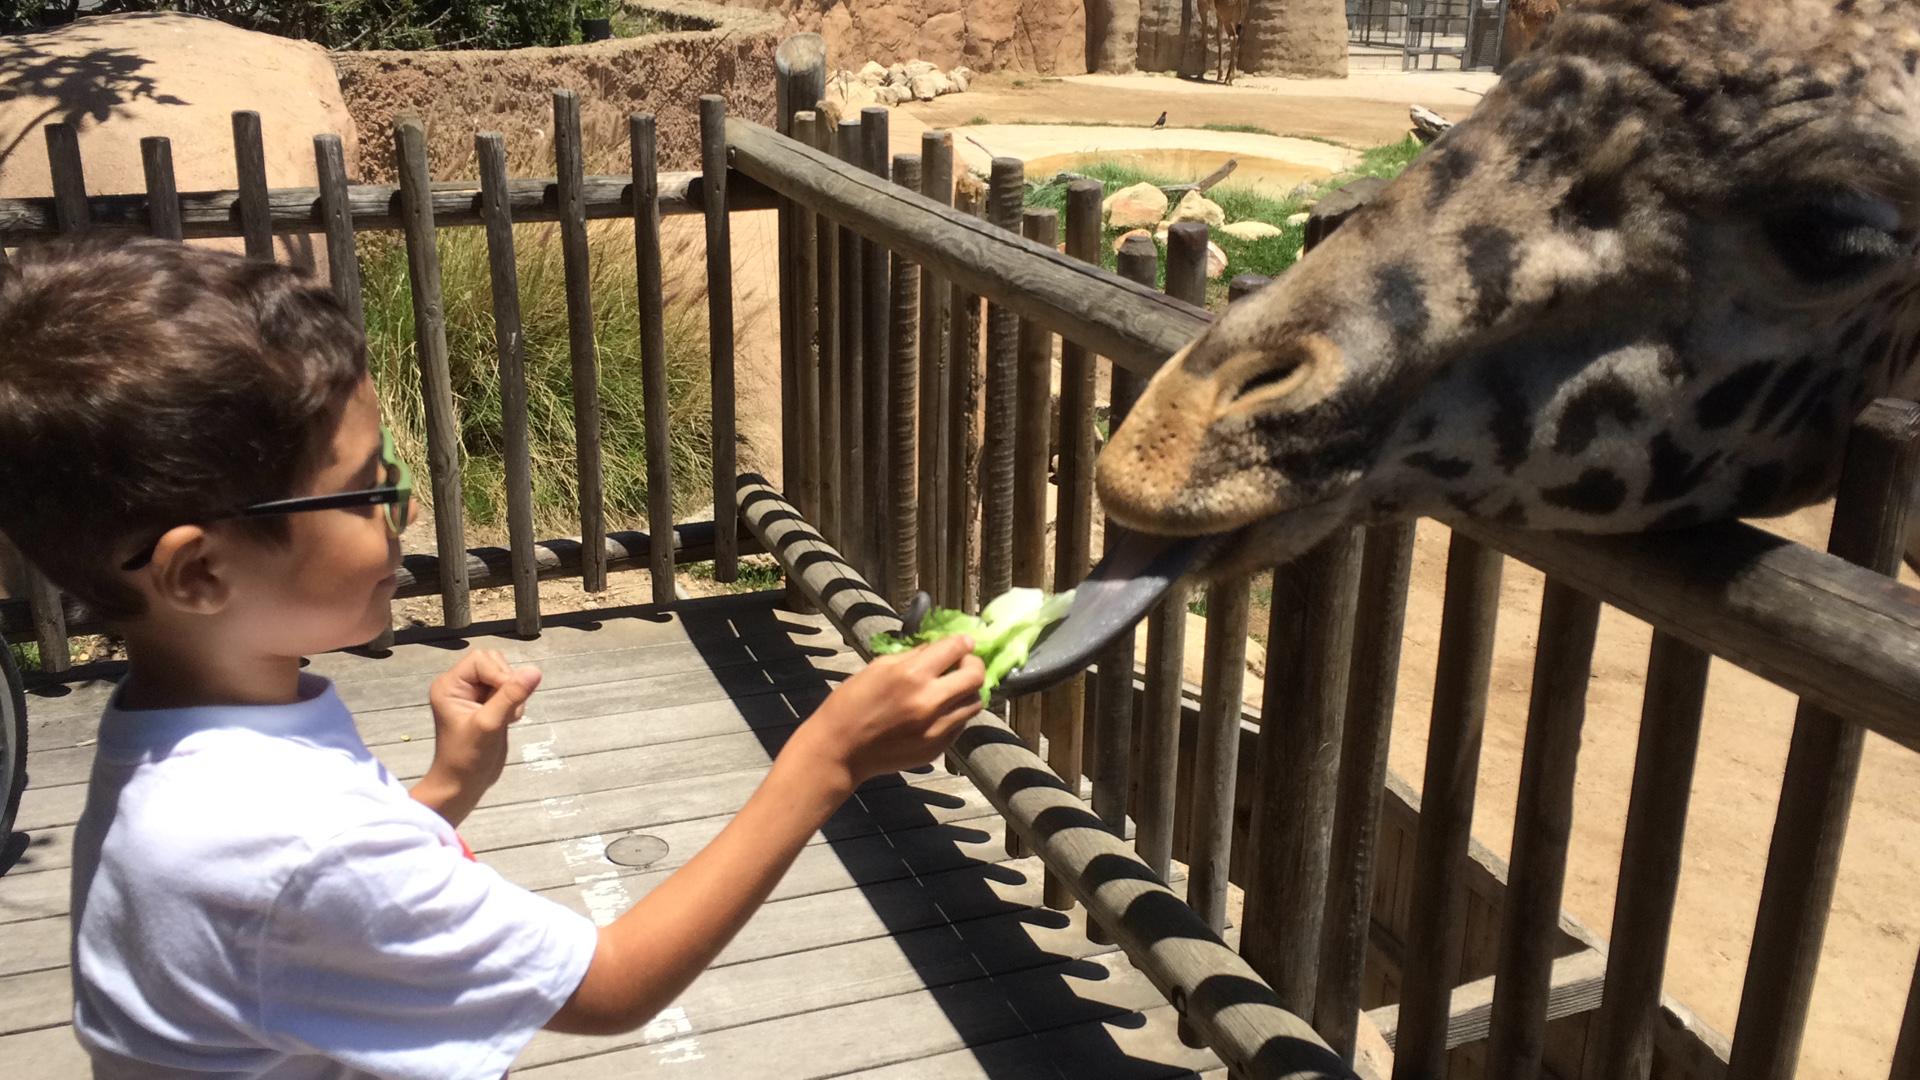 feeding the giraffe at the Santa Barbara Zoo